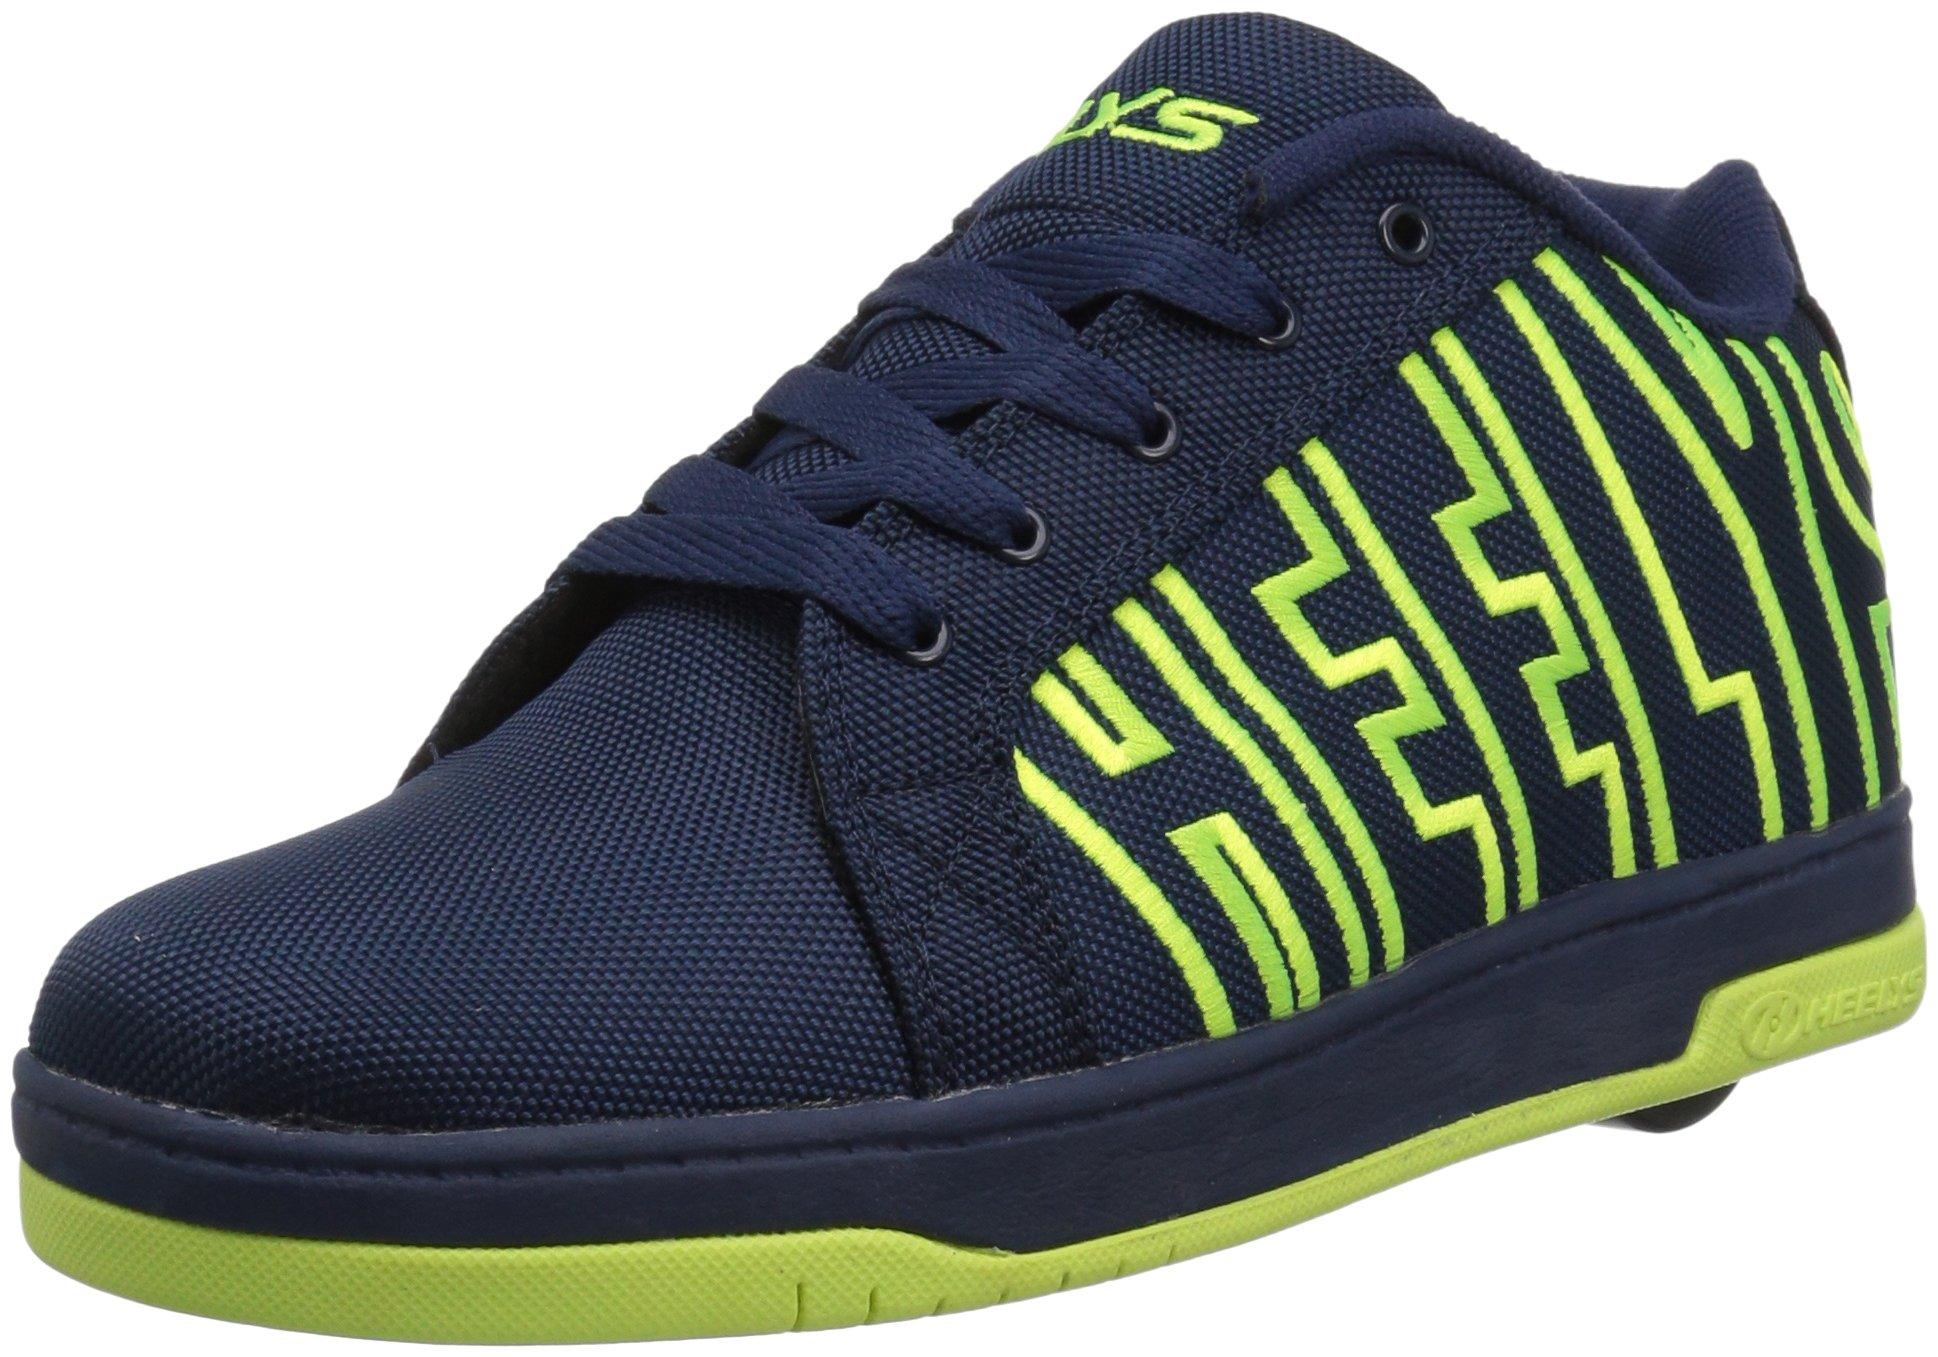 Heelys Boys' Split Sneaker, Navy/Bright Yellow, 3 Medium US Big Kid by Heelys